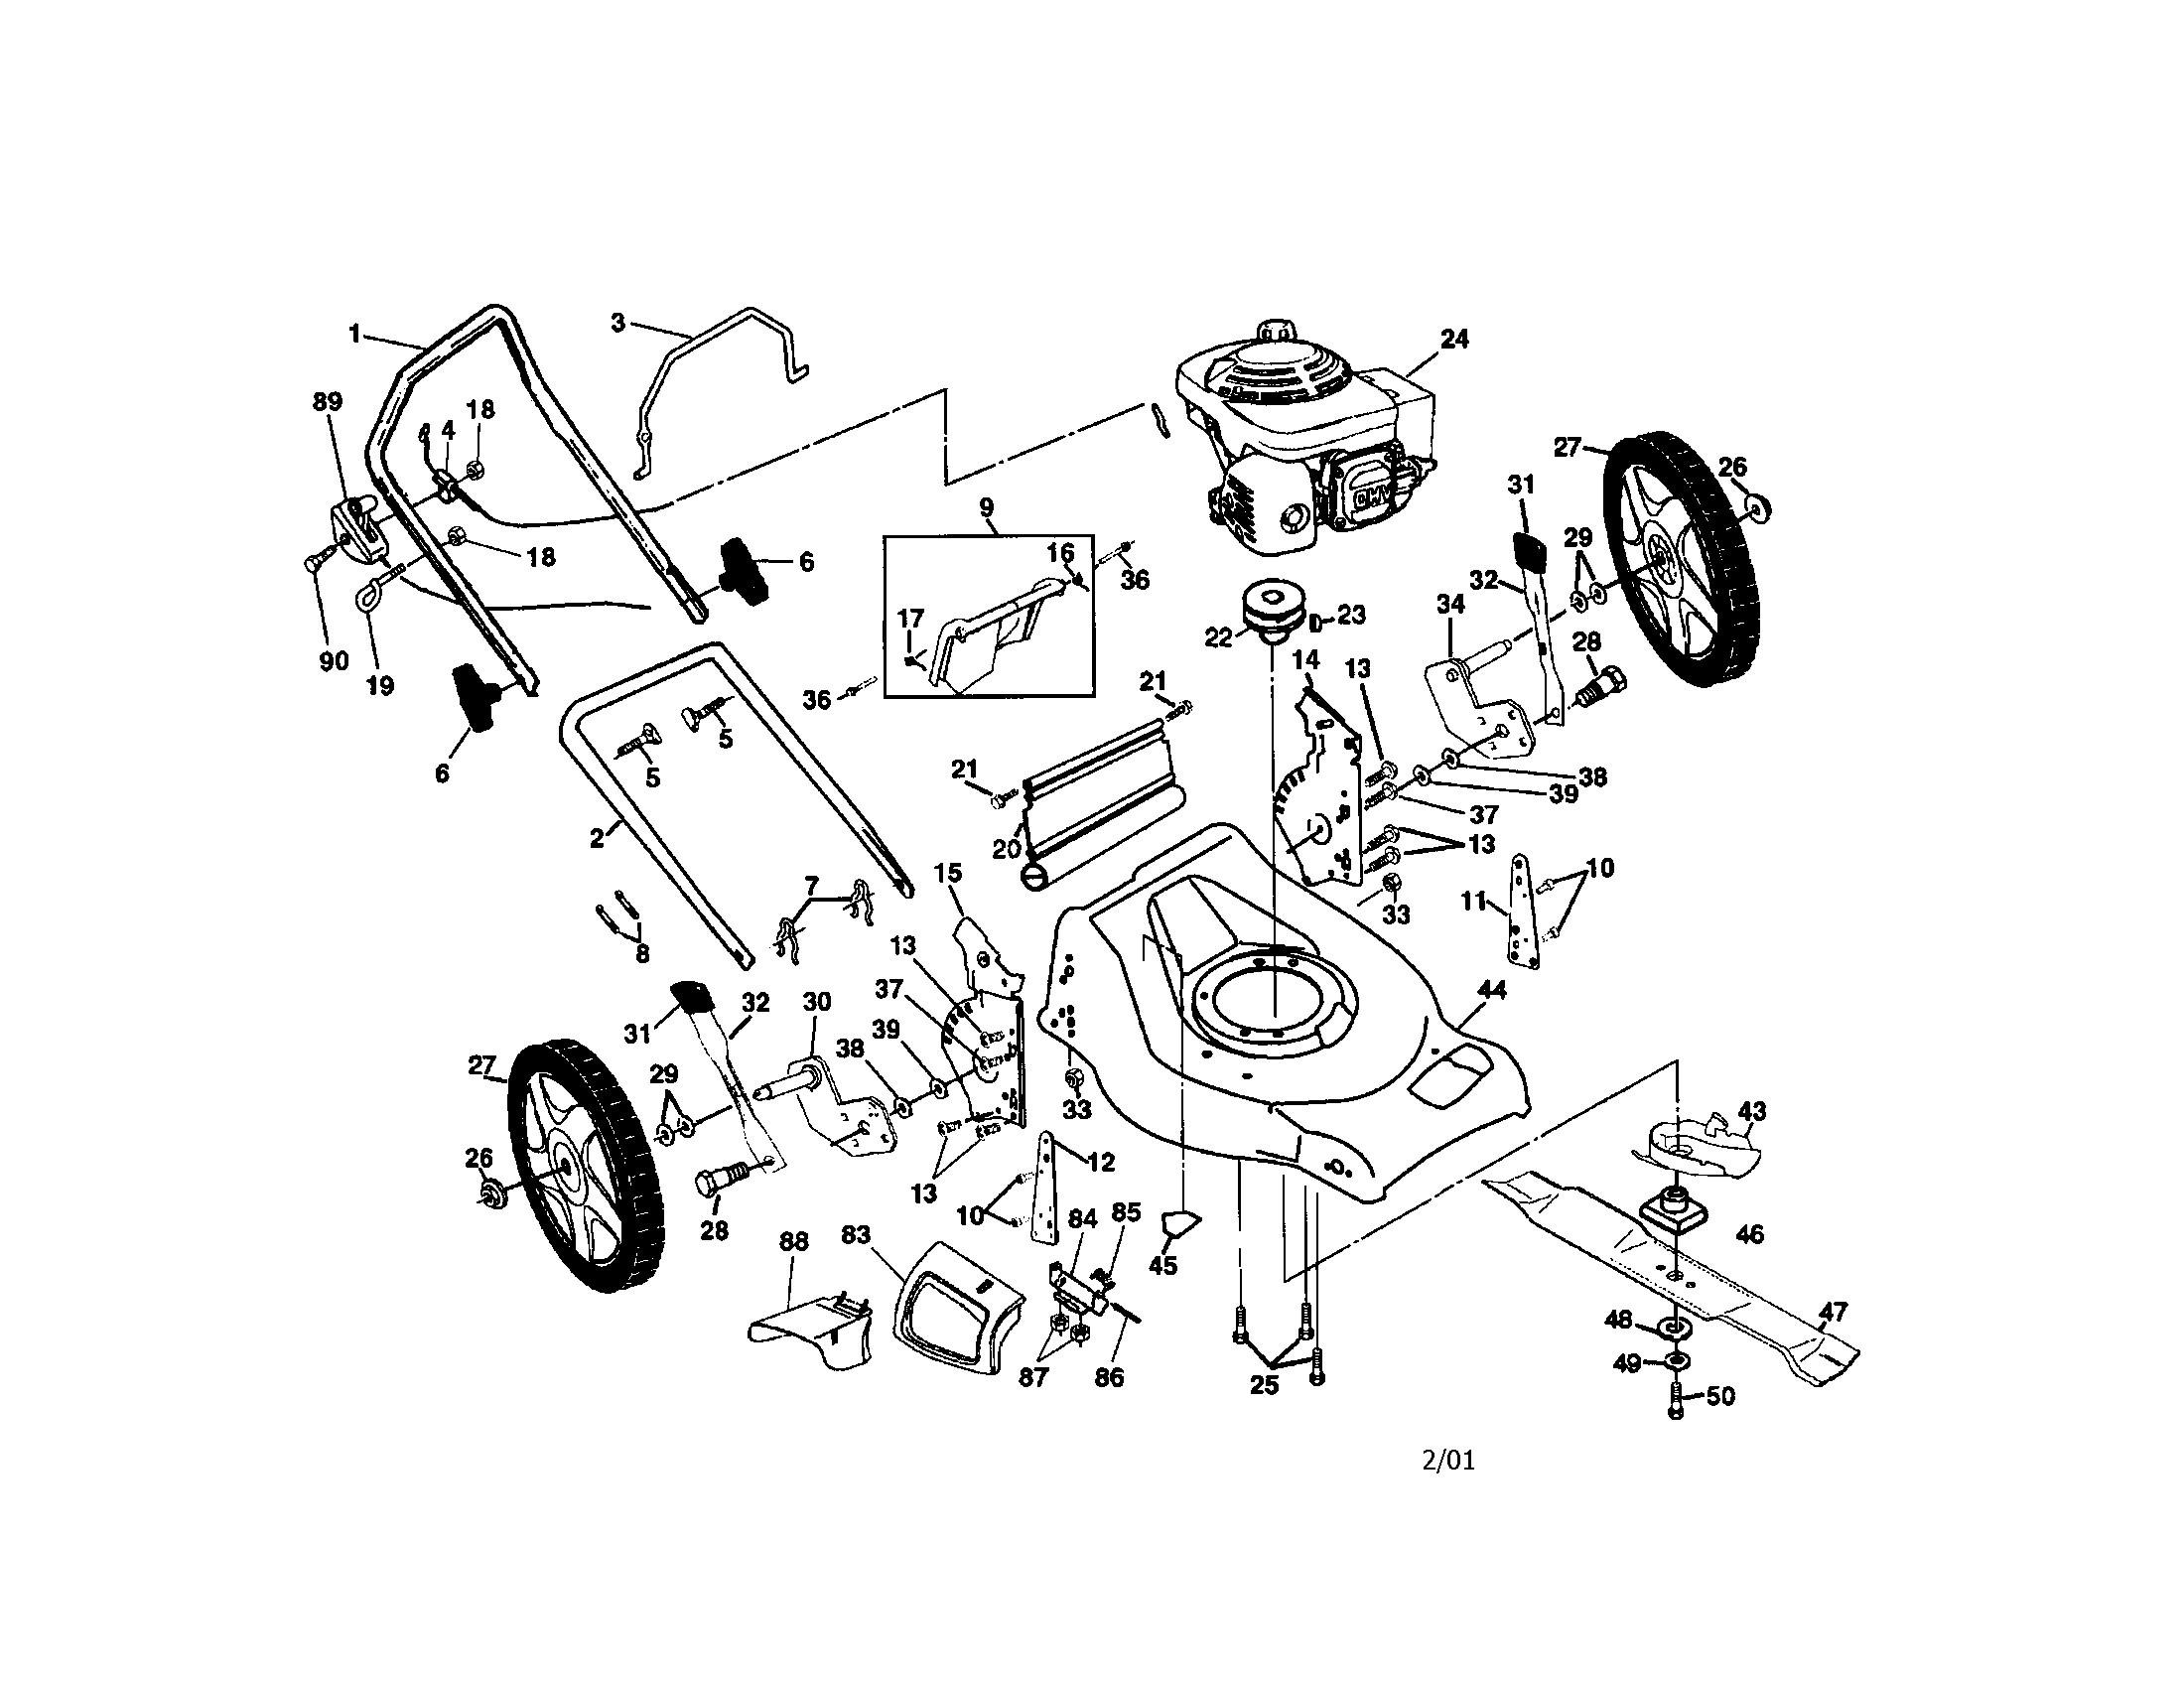 Honda 185s Engine Diagram - Wiring Diagram 500 on toyota 3.5 engine diagram, gm 3.5 engine diagram, tecumseh 3.5 engine diagram, chevy 3.5 engine diagram, dodge 3.5 engine diagram, kia 3.5 engine diagram, nissan 3.5 engine diagram, oldsmobile 3.5 engine diagram, isuzu 3.5 engine diagram, hummer 3.5 engine diagram,